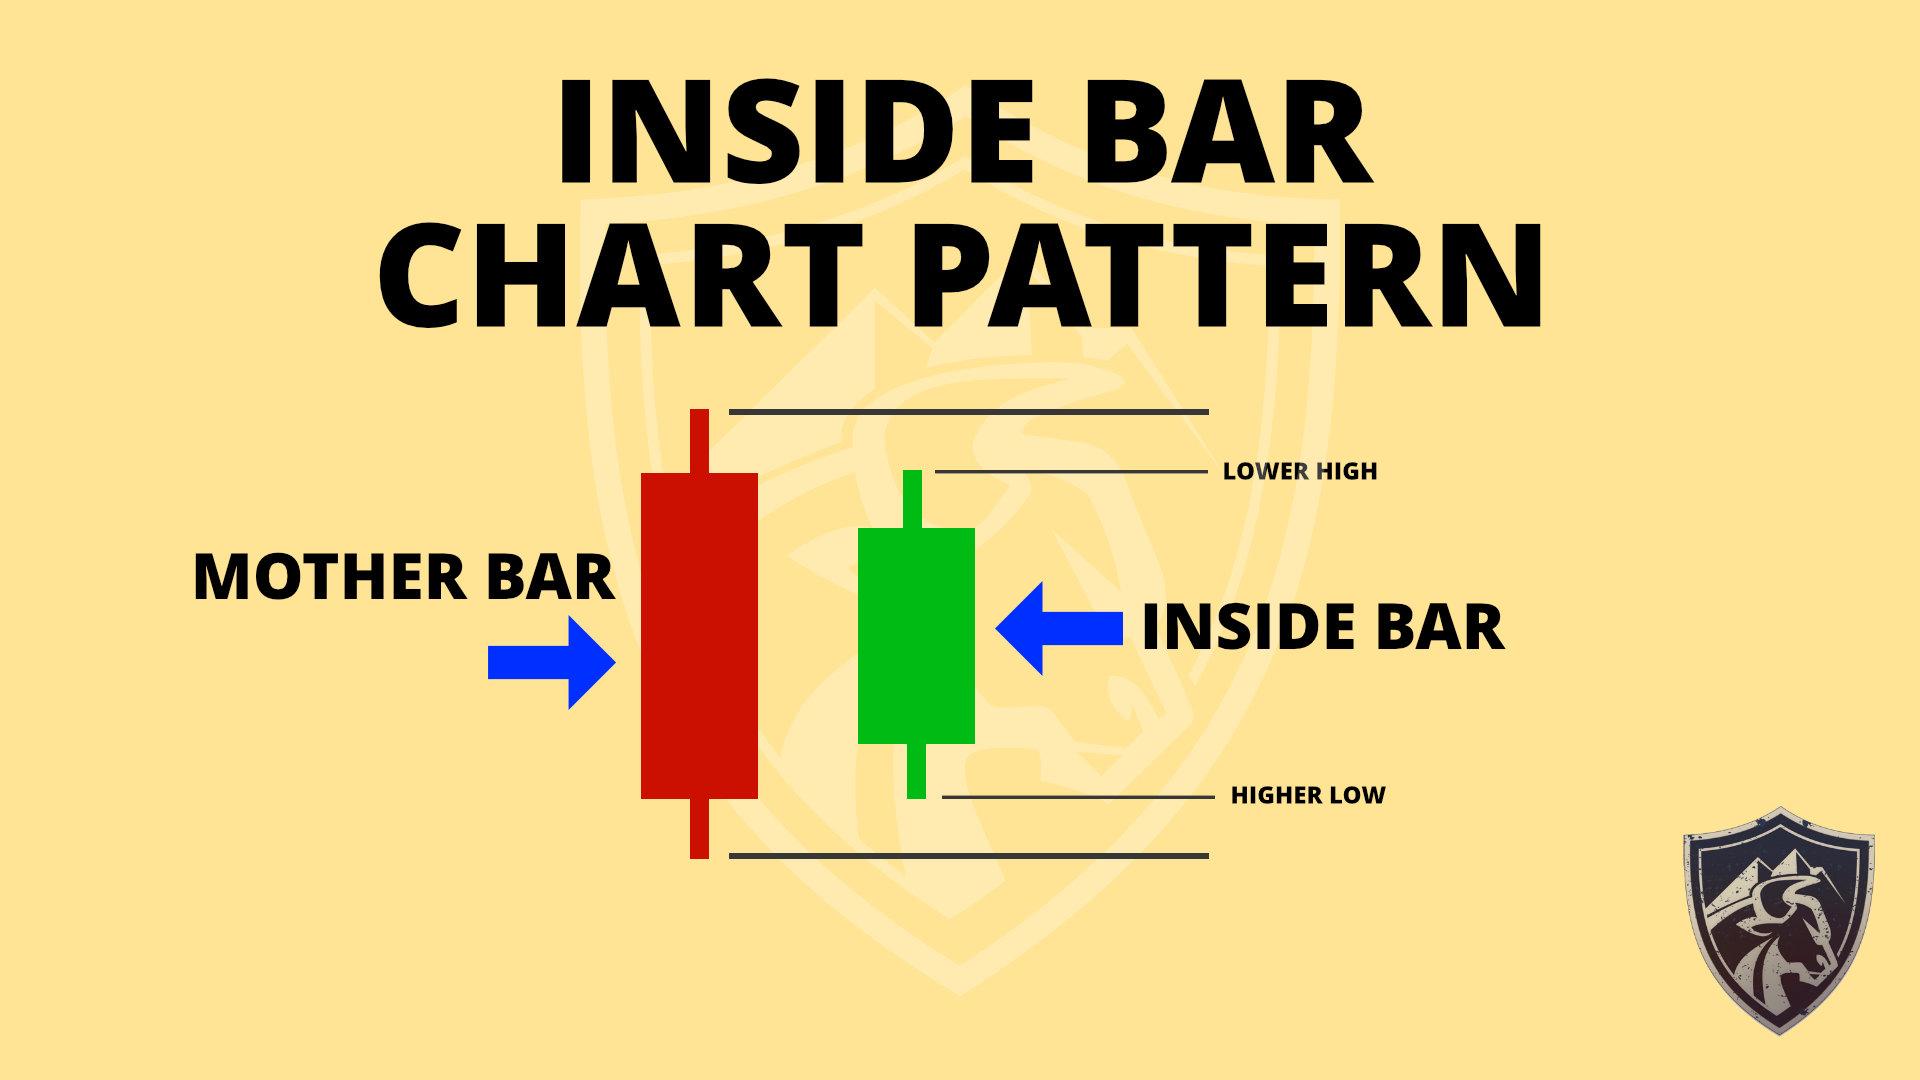 Inside bar chart pattern